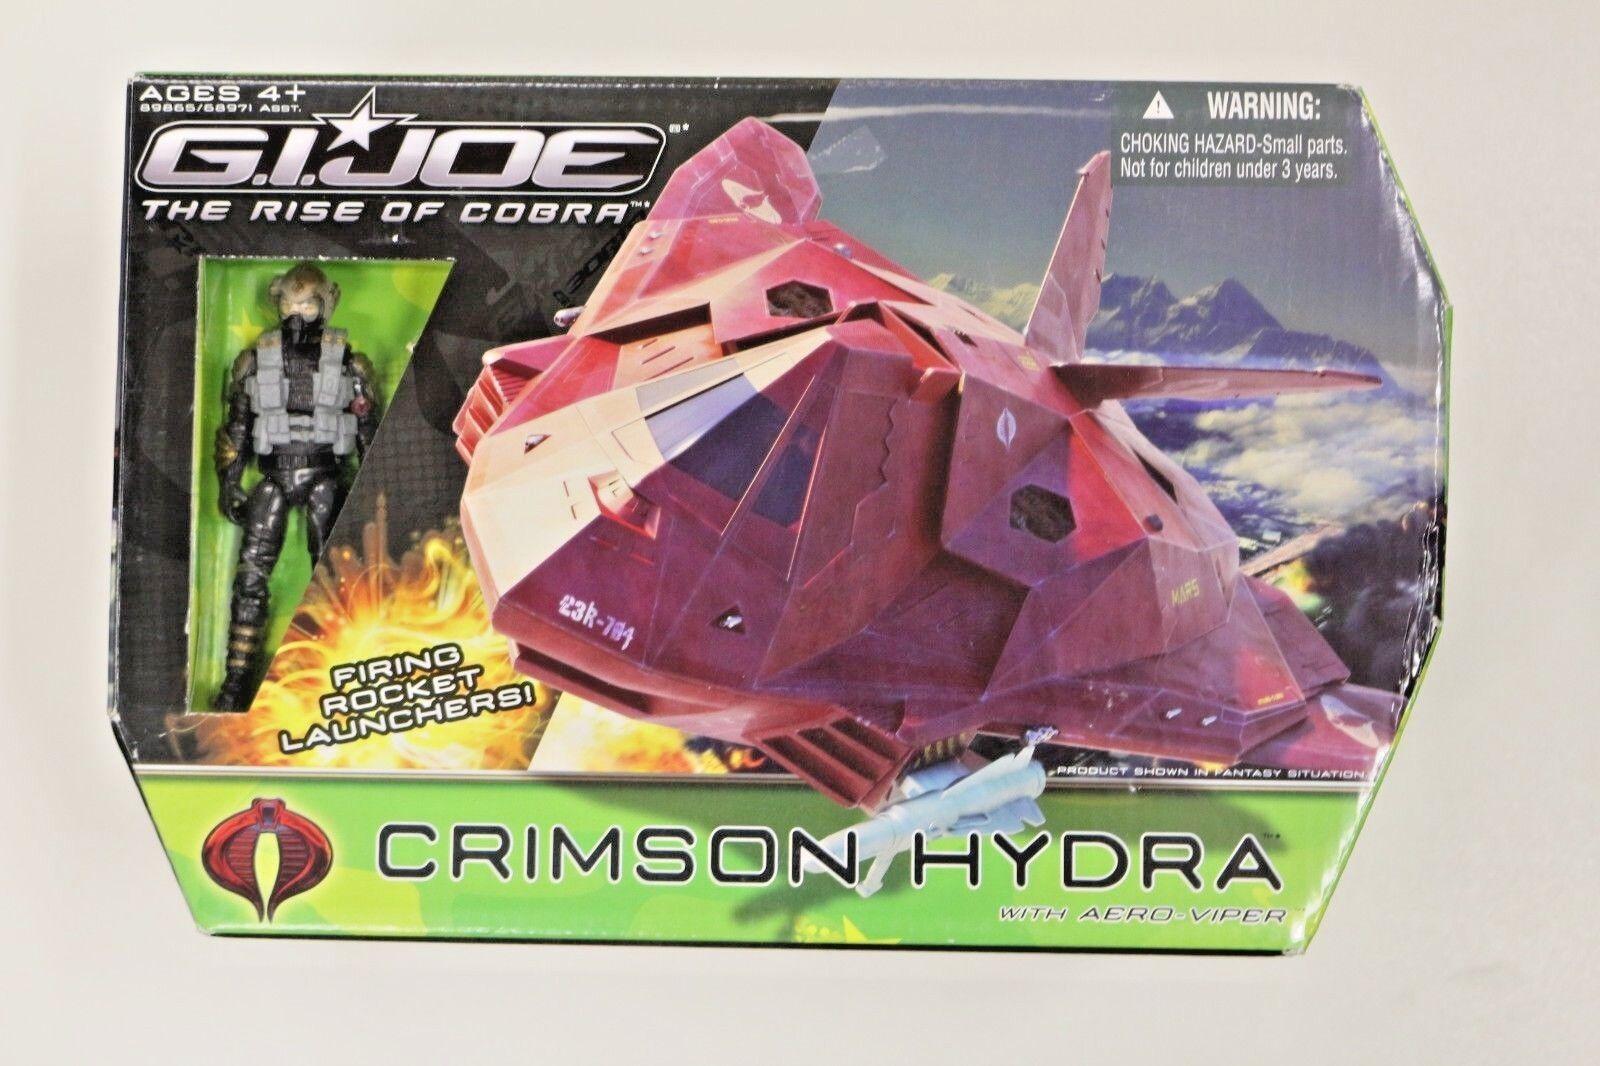 G.I. Joe Crimson Hydra with Aero Viper Rise of Cobra Pursuit